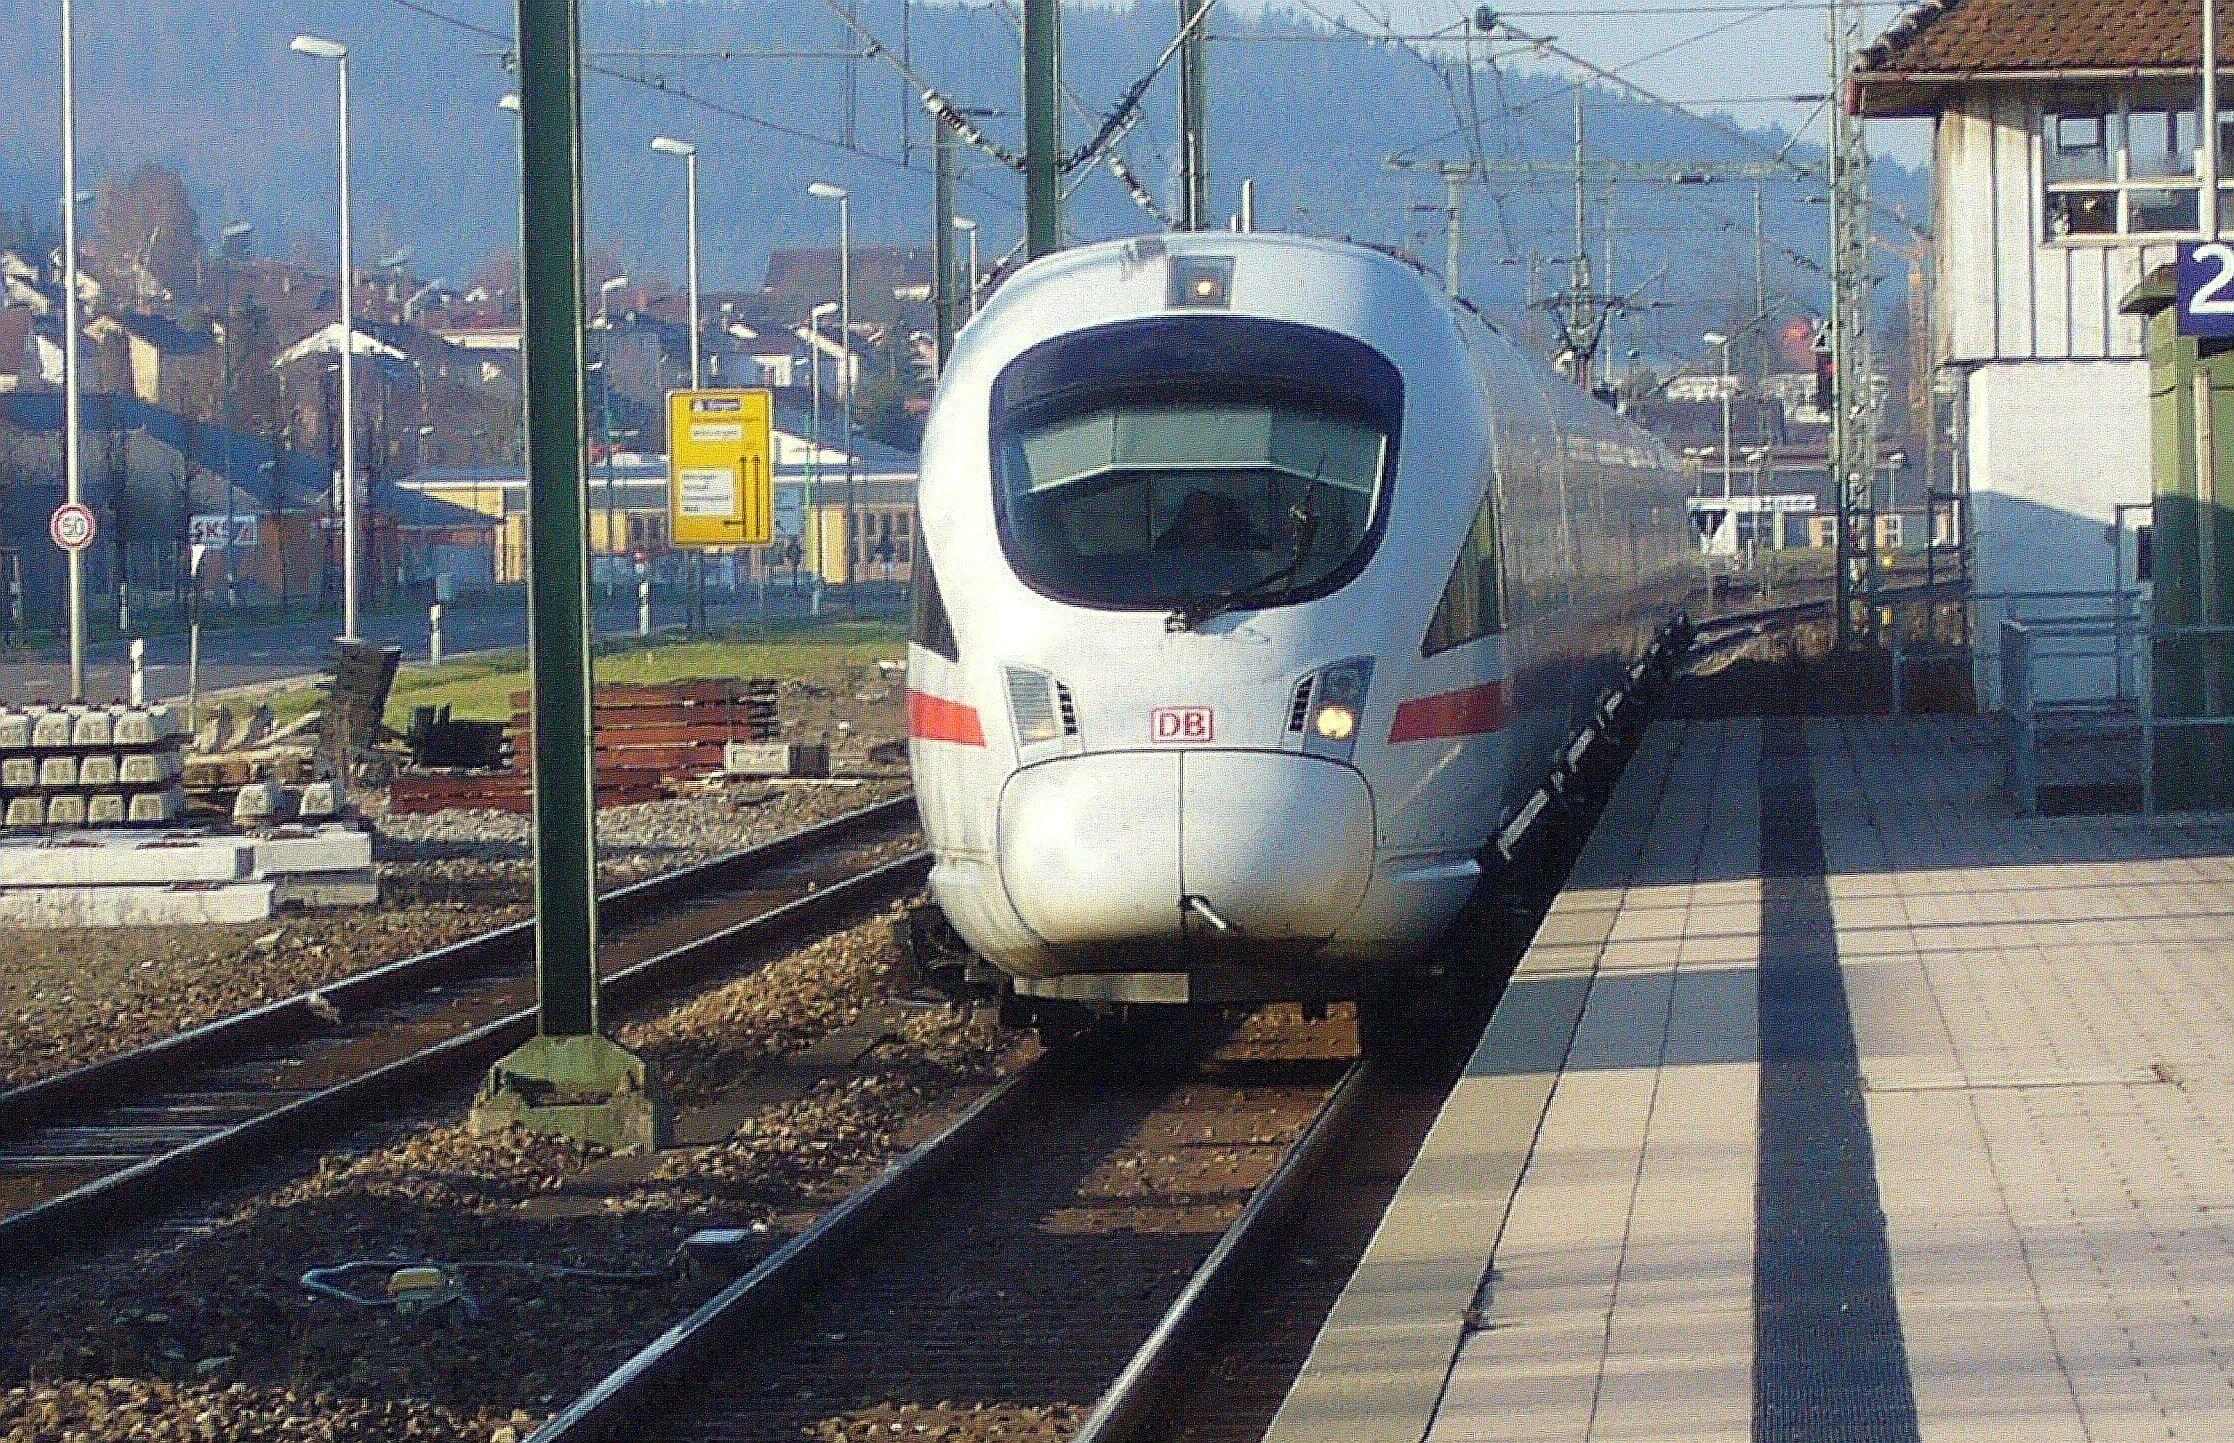 Pociąg ICE. Fot Donautalbahner, Wikimedia Commons